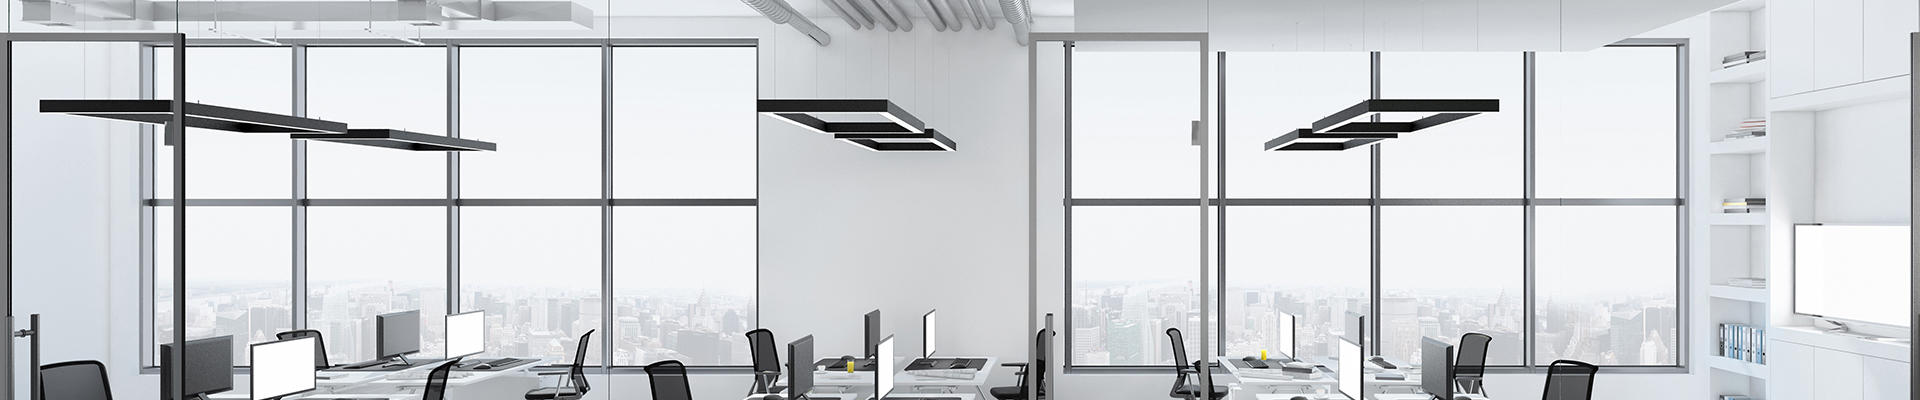 architectrual linear led pendant light fixtures